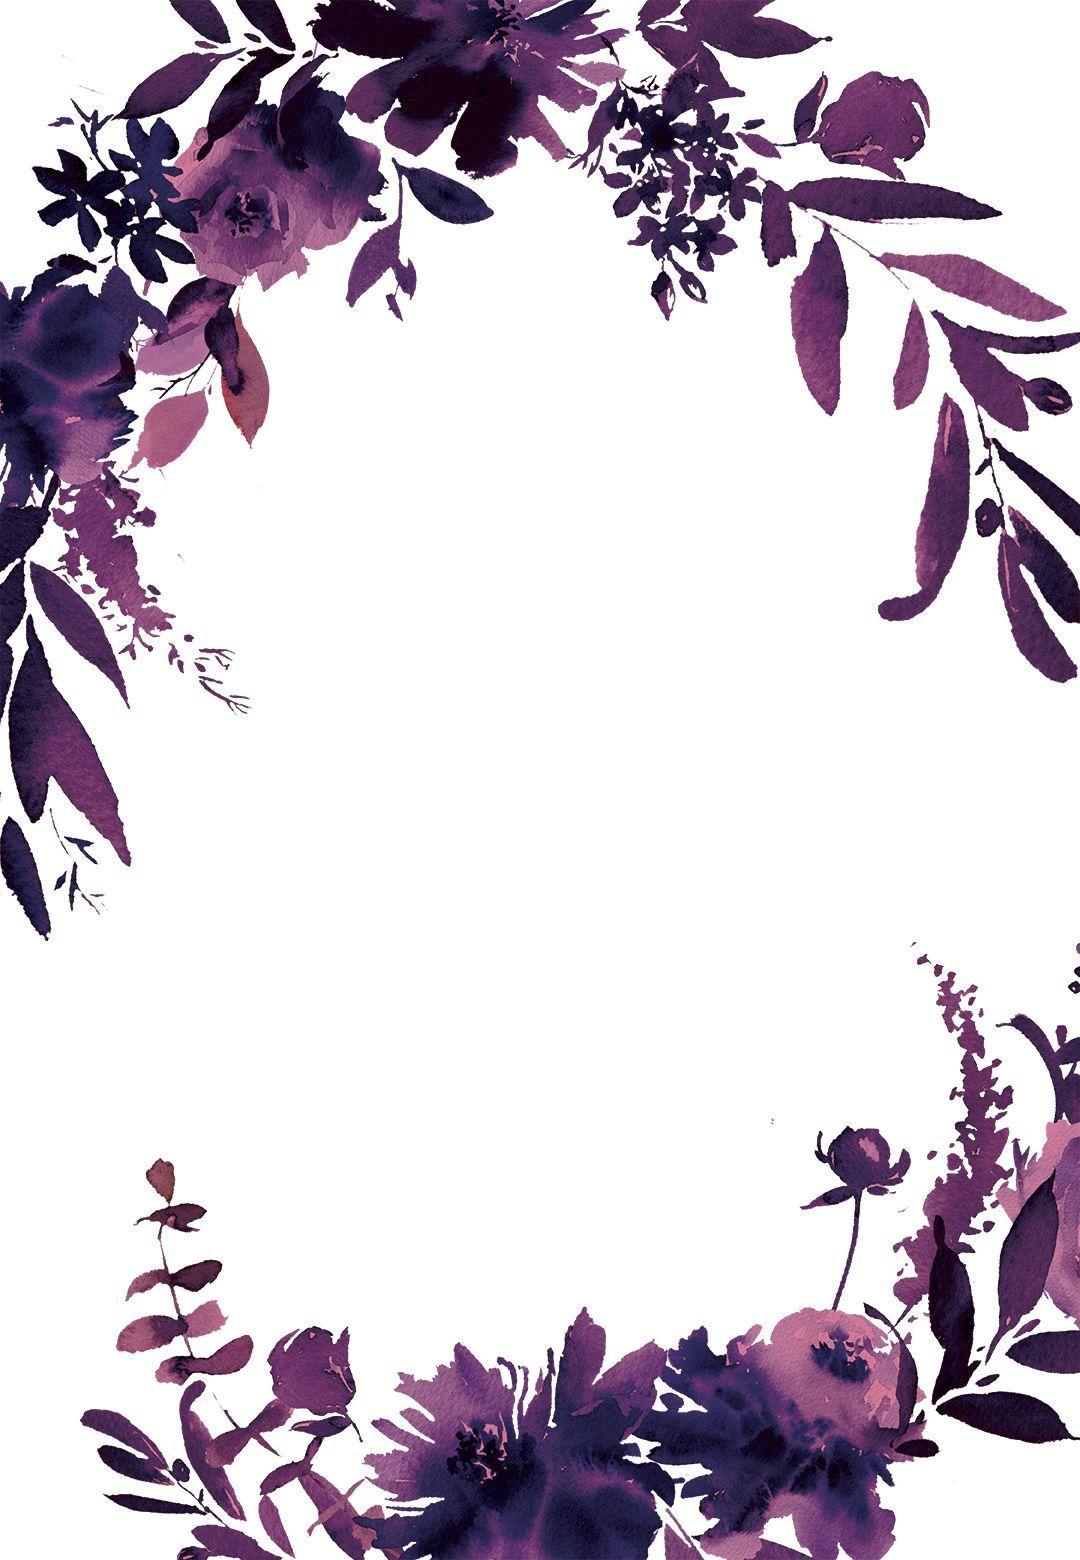 Indigo Flowers - Birthday Invitation Template (free)  Greetings